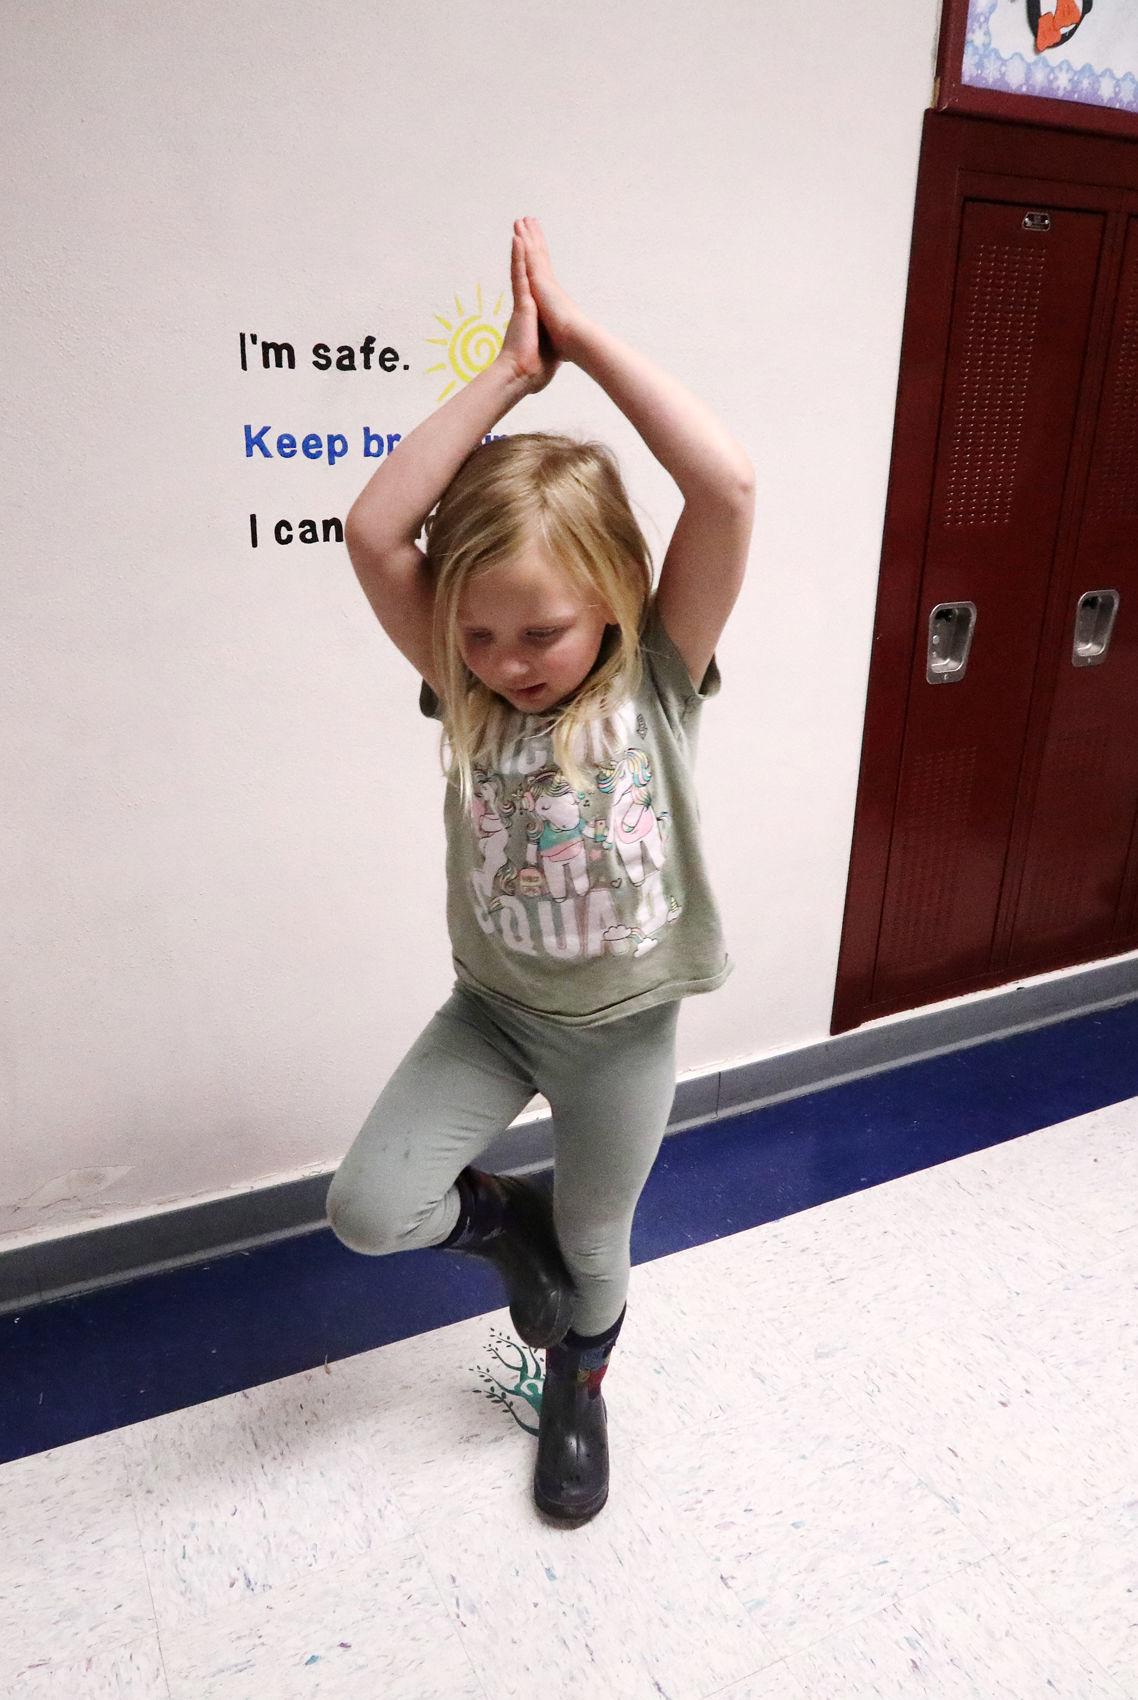 Anaconda school children get lessons in social and emotional skills